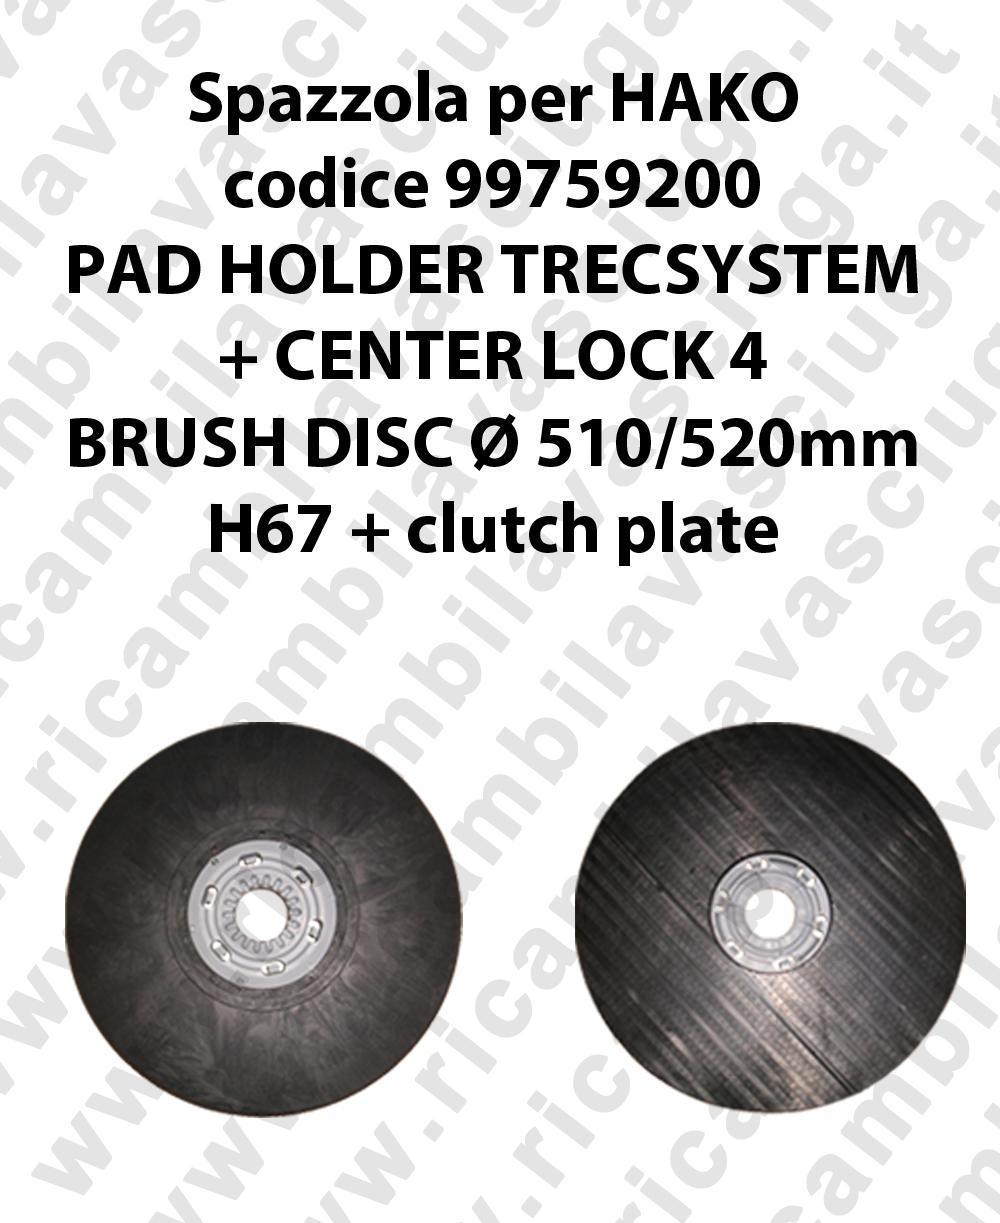 PAD HOLDER TRECSYSTEM  para fregadora HAKO codice 99759200